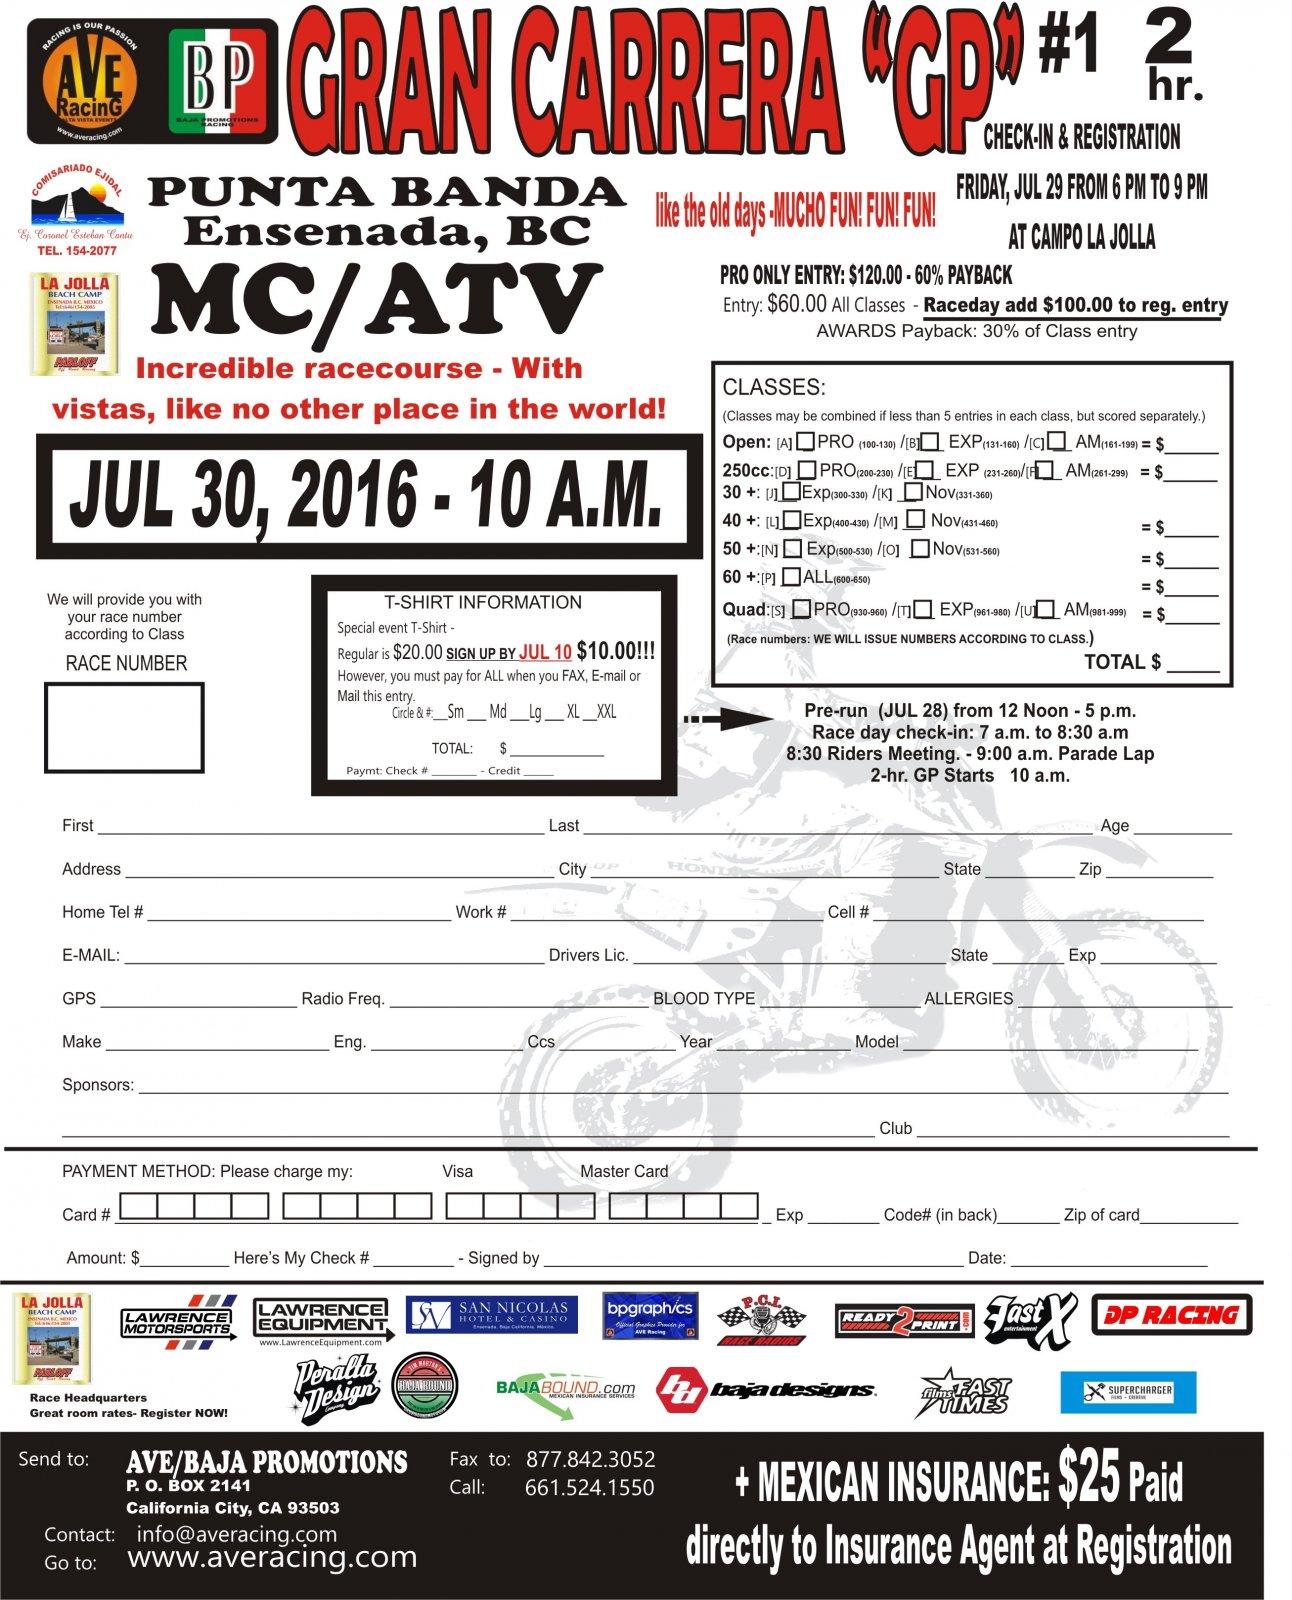 16-PuntaBanda-MC-ATV-Entry-Jun29.JPG